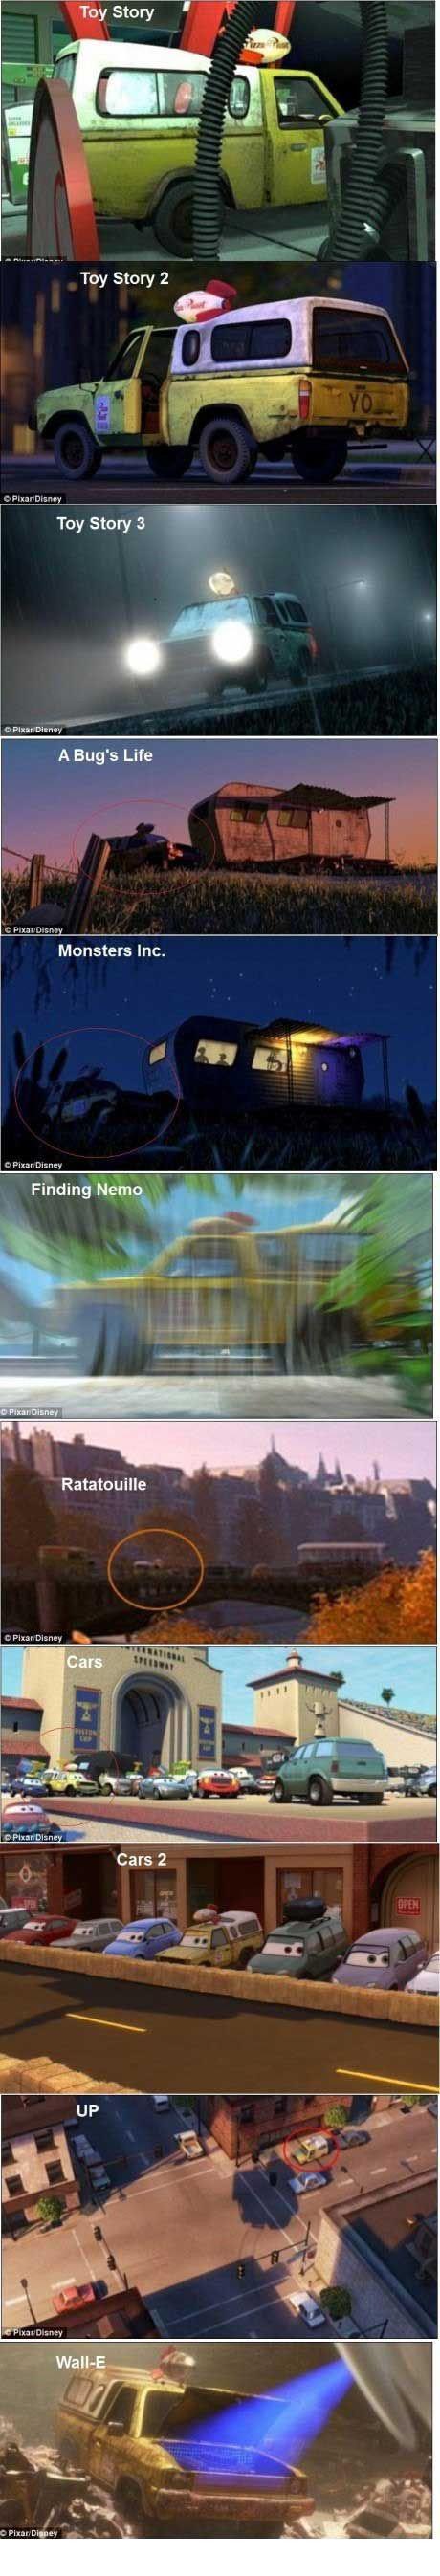 Pizza Planet. . Tay Story 3 Plndr. r? ihatey A Bug' s Lite Monsters inc. i 2' Pilaf Disney b rm Ratatouille i E F' IJI.: H Disobey C? Paar Dir, FIE Disney Pizza planet pixar Toy Story